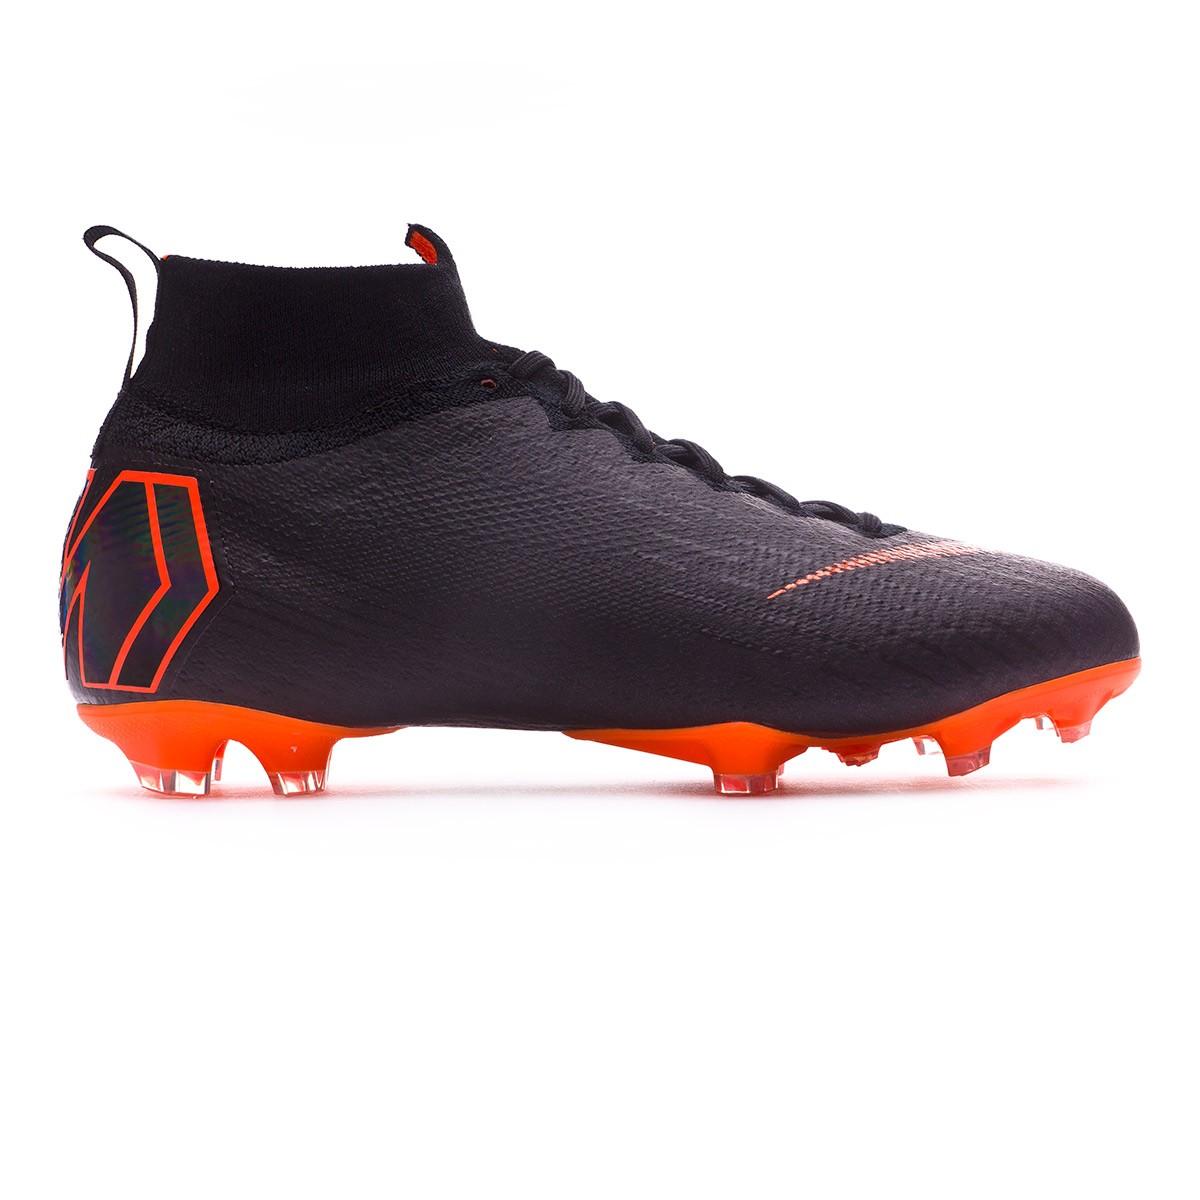 a5850167c Football Boots Nike Kids Mercurial Superfly VI Elite FG Black-Total orange- White - Football store Fútbol Emotion